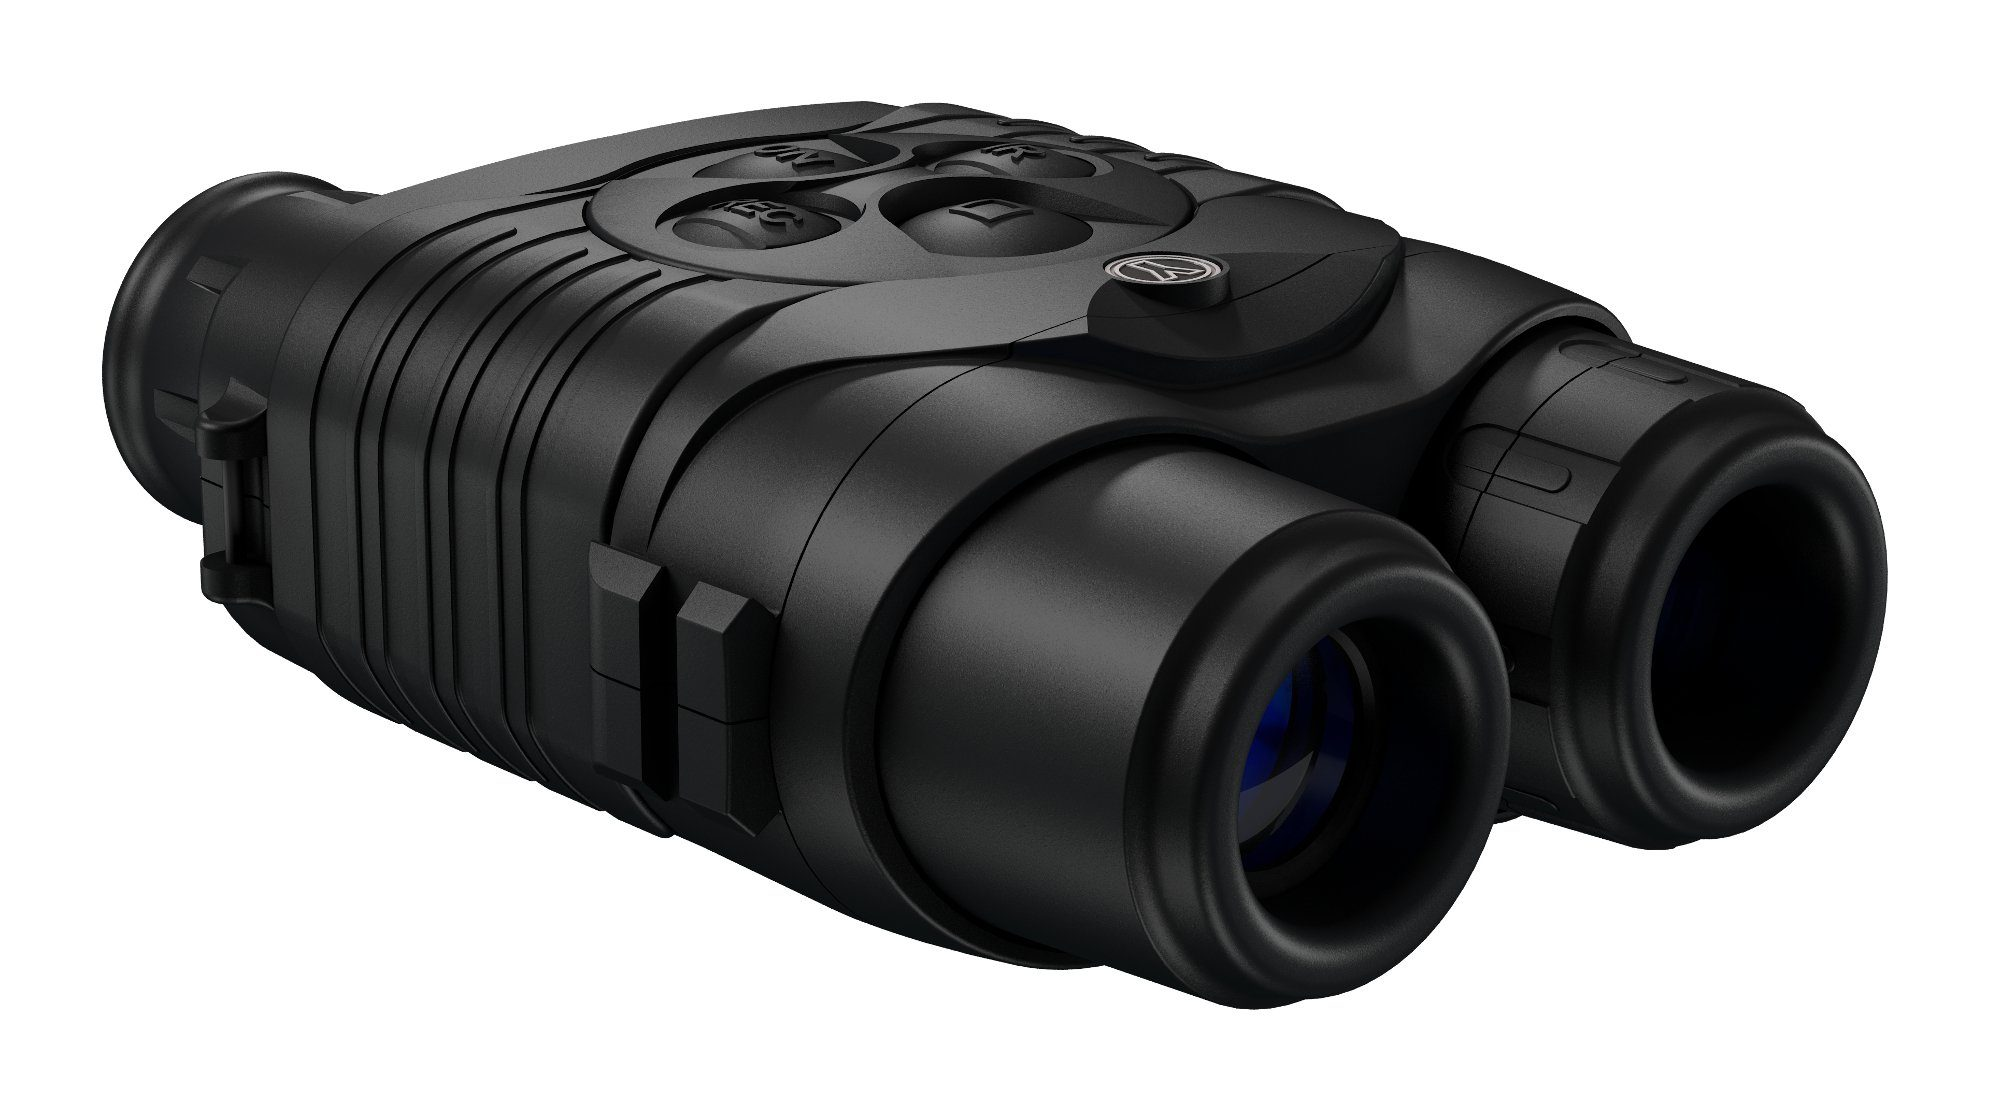 Yukon Nachtsichtgerät »Signal N320 RT 4.5x28 Digital mono«